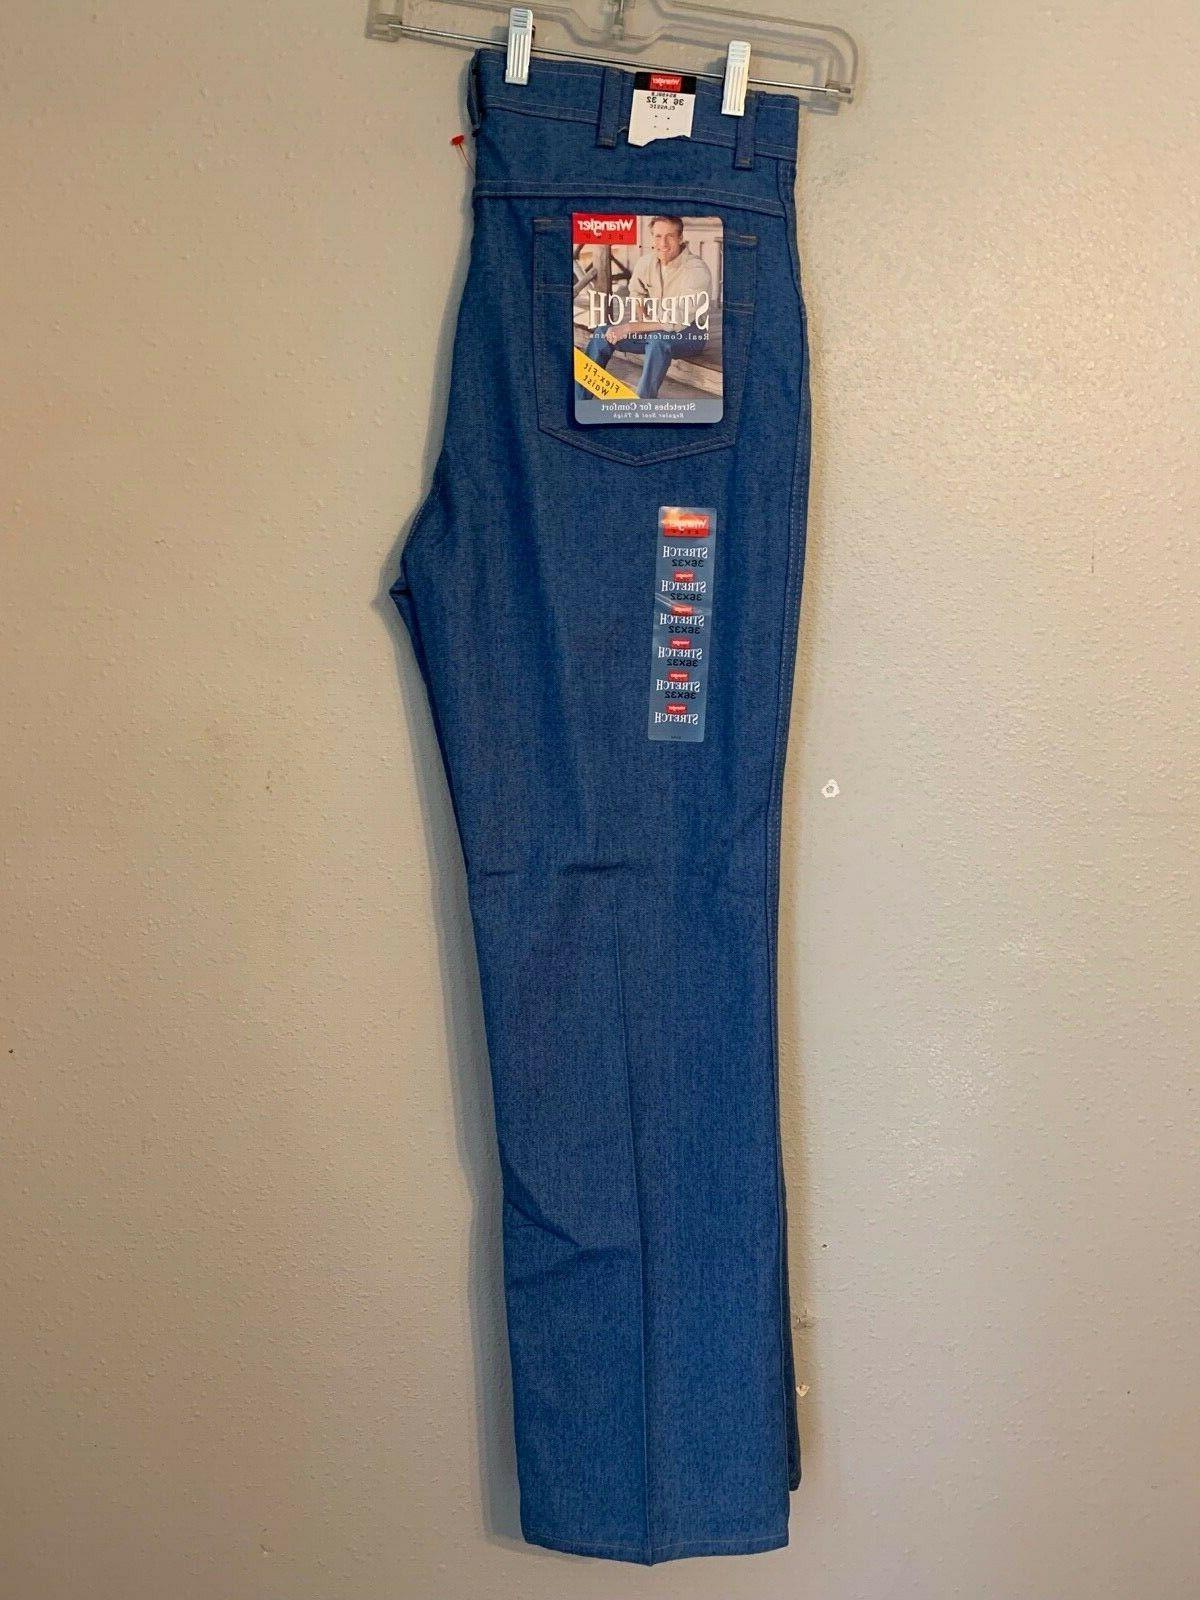 Mens Jeans 36x32 NWT